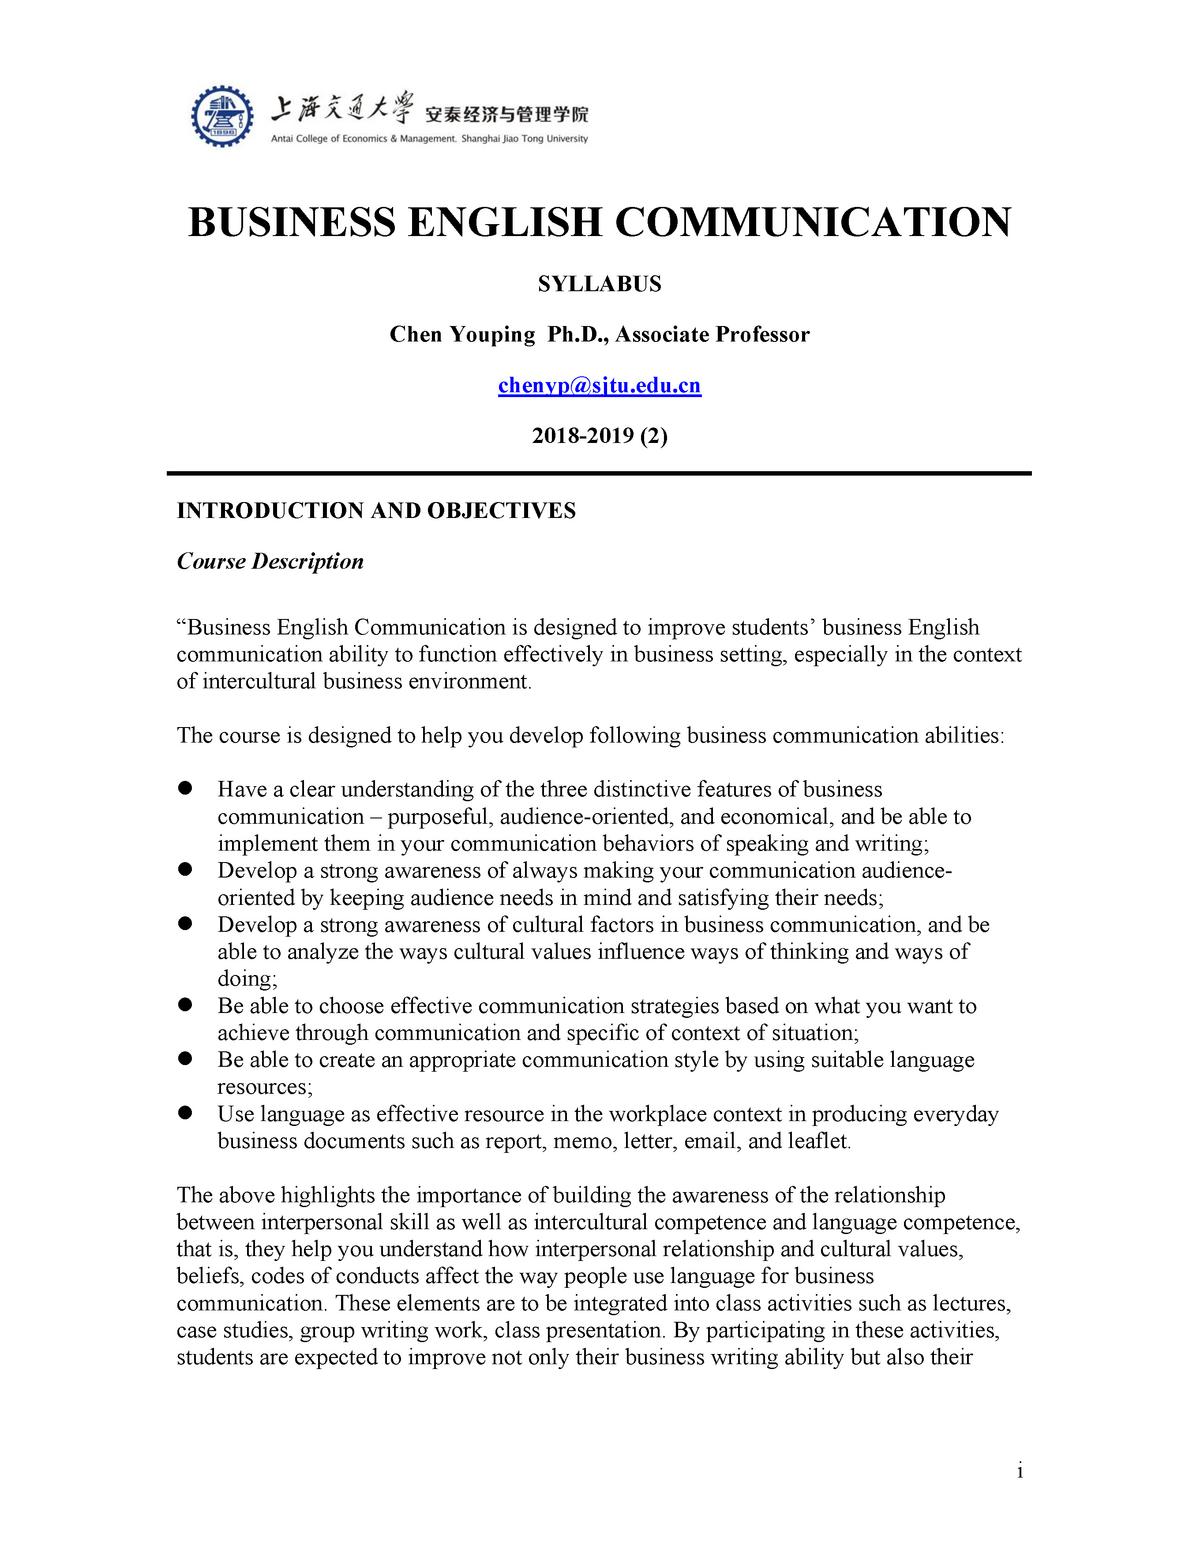 Business English Communication - EN315: Business